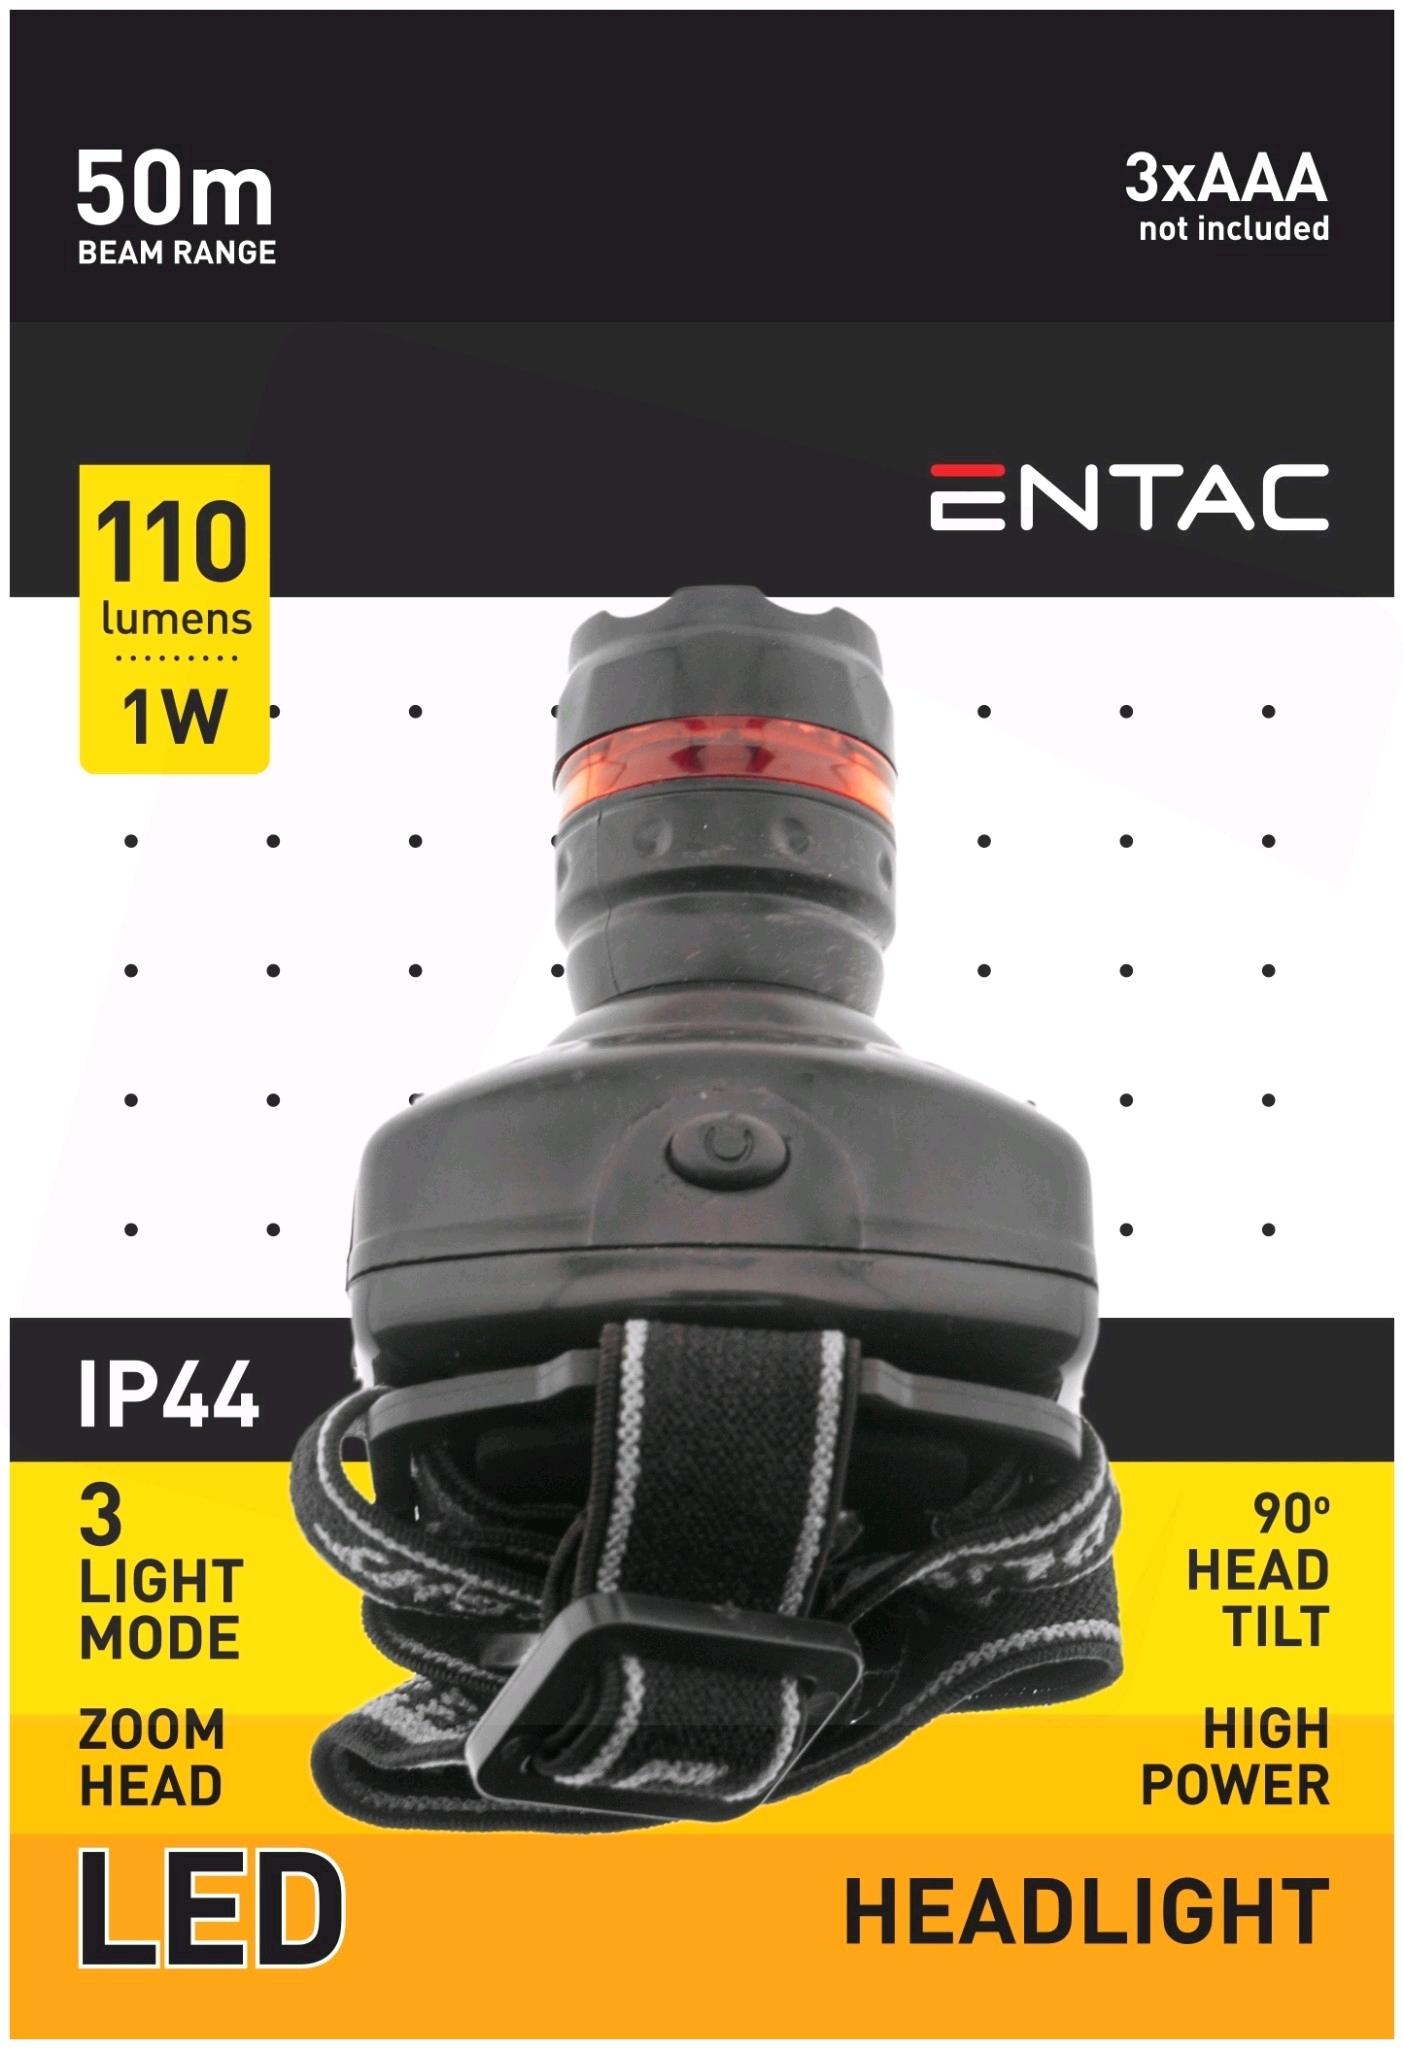 Entac Headlight Zoom 1W Plastic